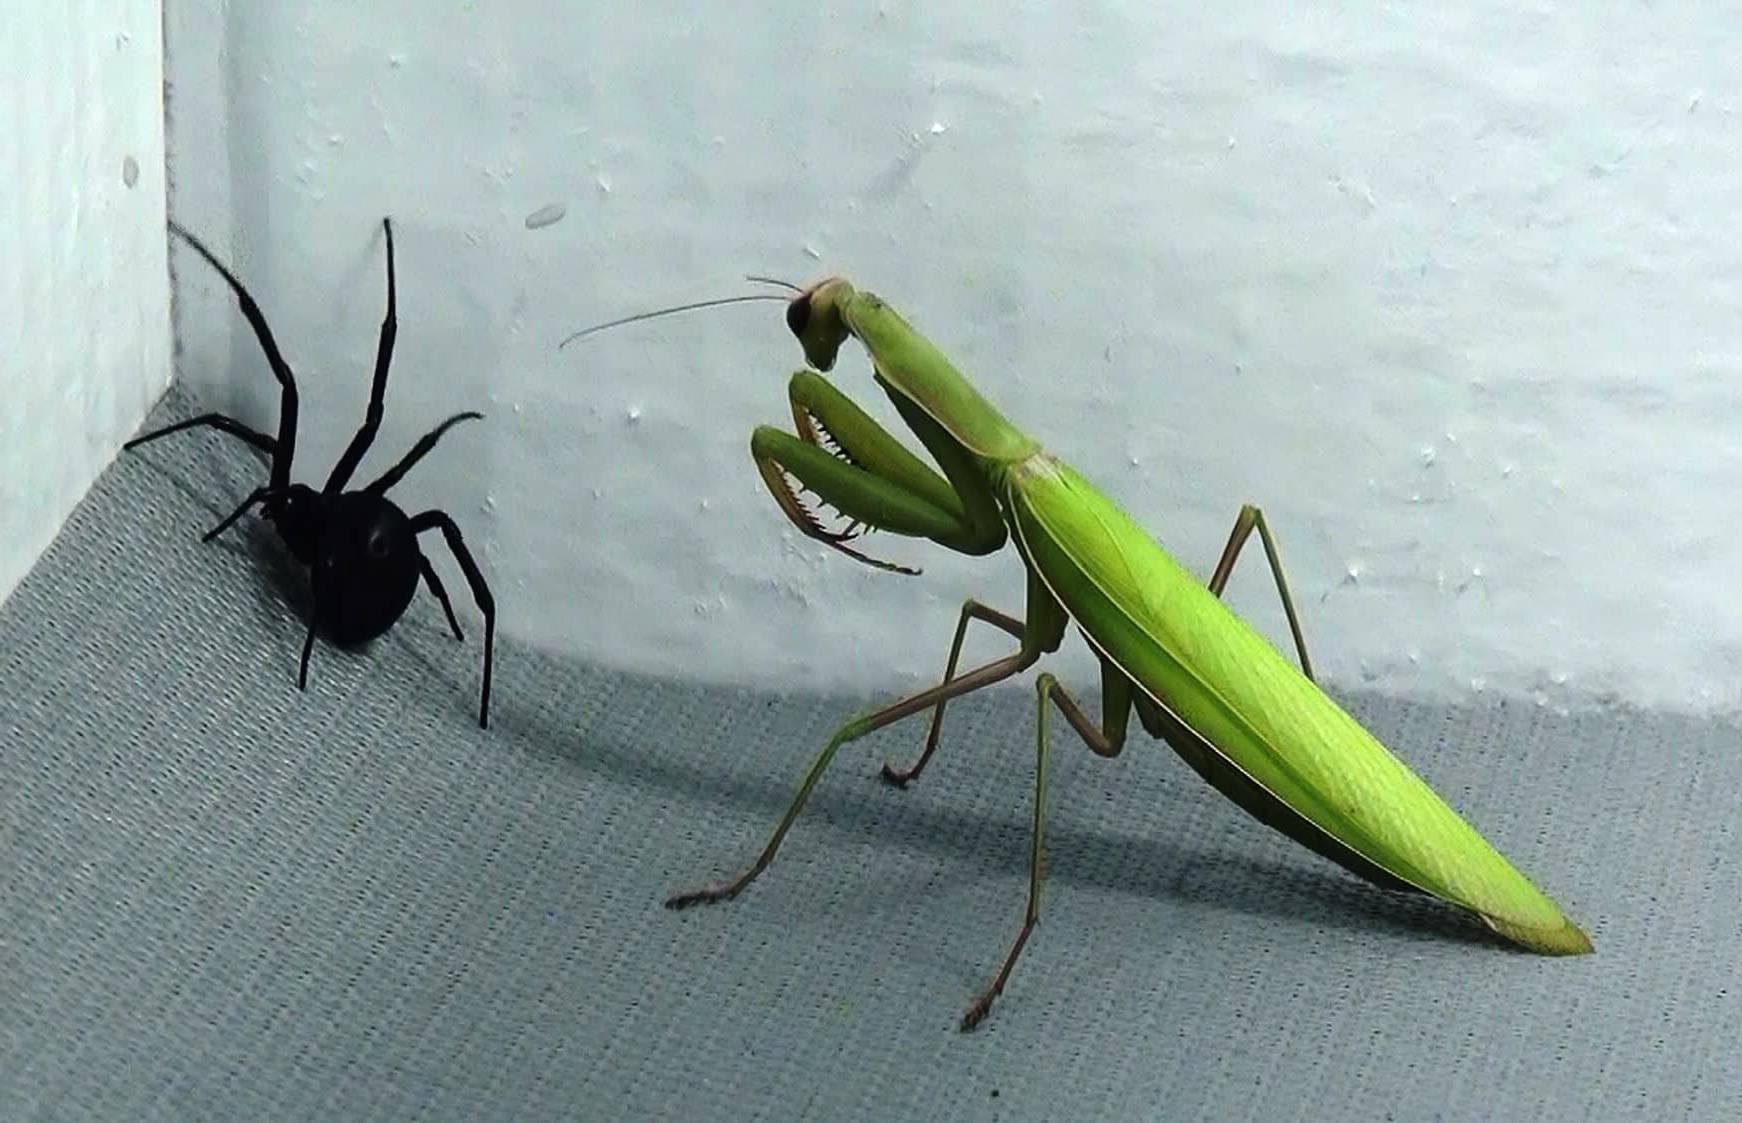 mantis religiosa cazando para alimentarse